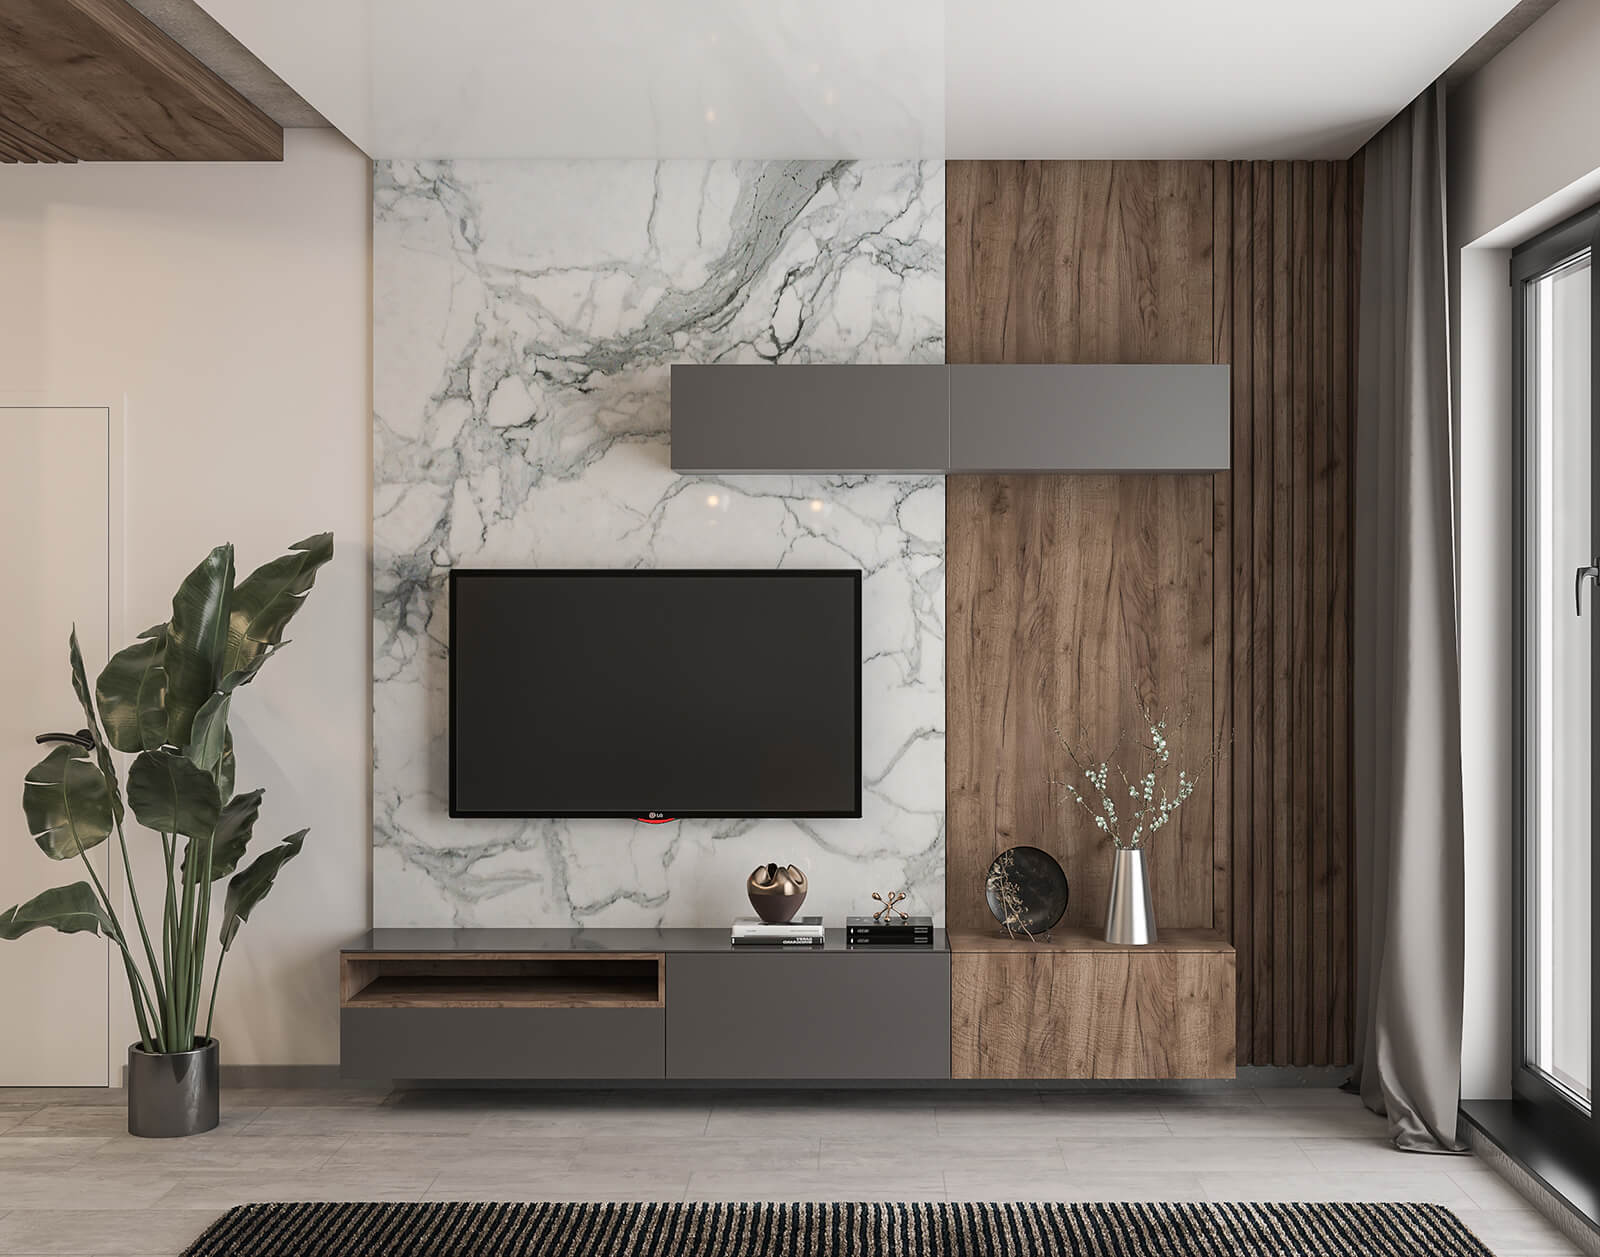 interioren-dizain-proekt-na-vsekidnevna-verde-by-esteta